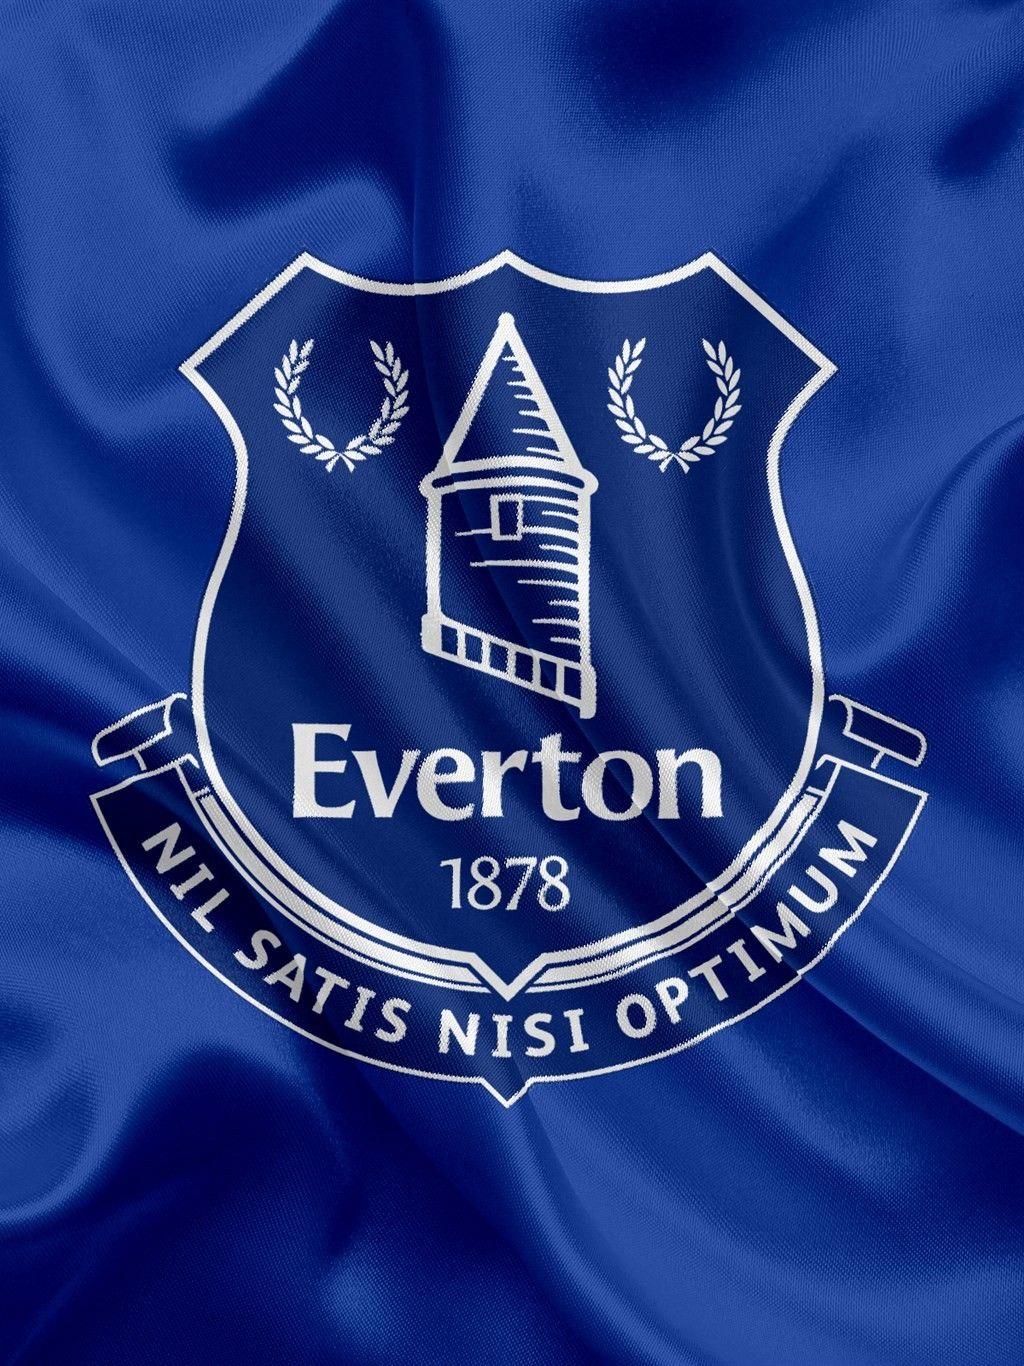 Pin On Evertonfc